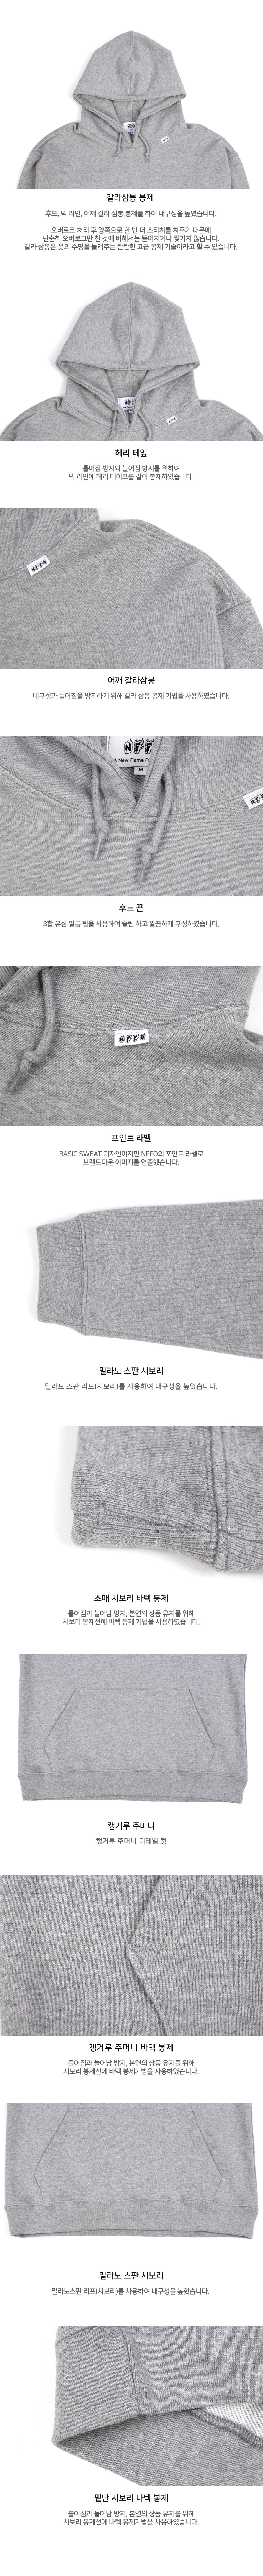 18 NFFO 2020FW Basic Sweat hoody gray 3.jpg